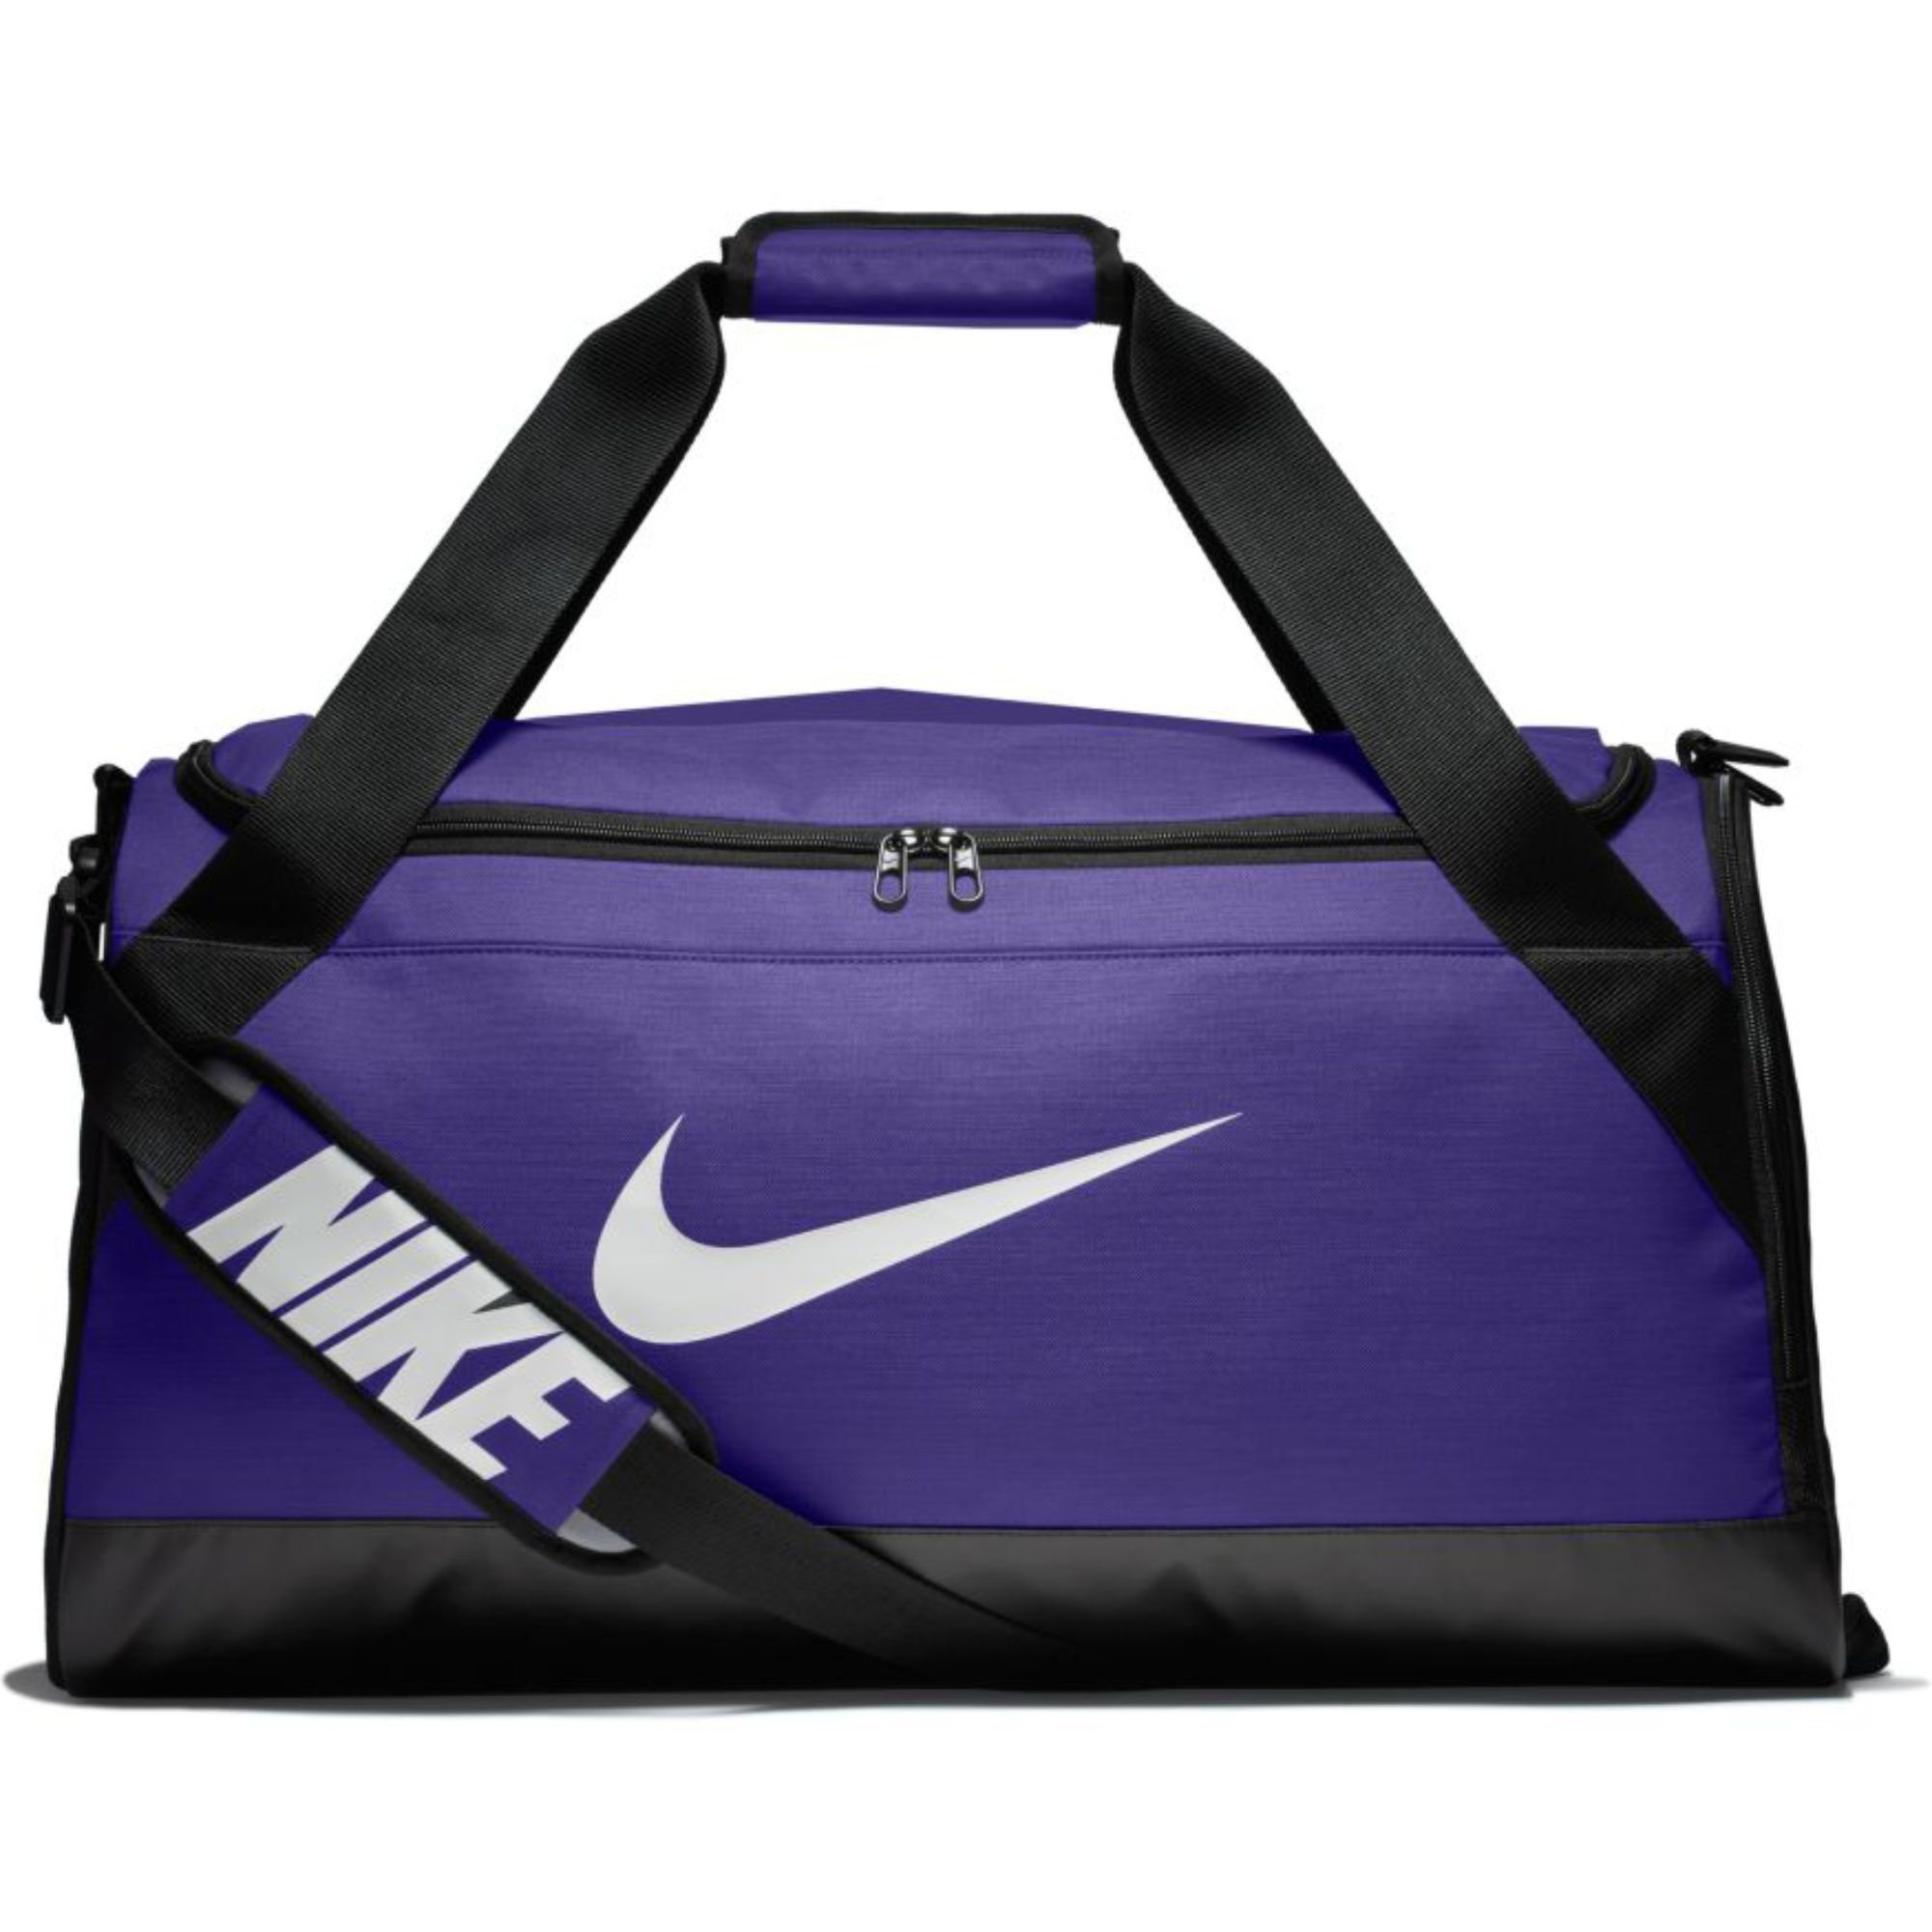 Galleon - Nike Brasilia (Medium) Training Duffel Bag - TM PURPLE BLACK WHITE  - BA5334-547 9e3367b67ce86